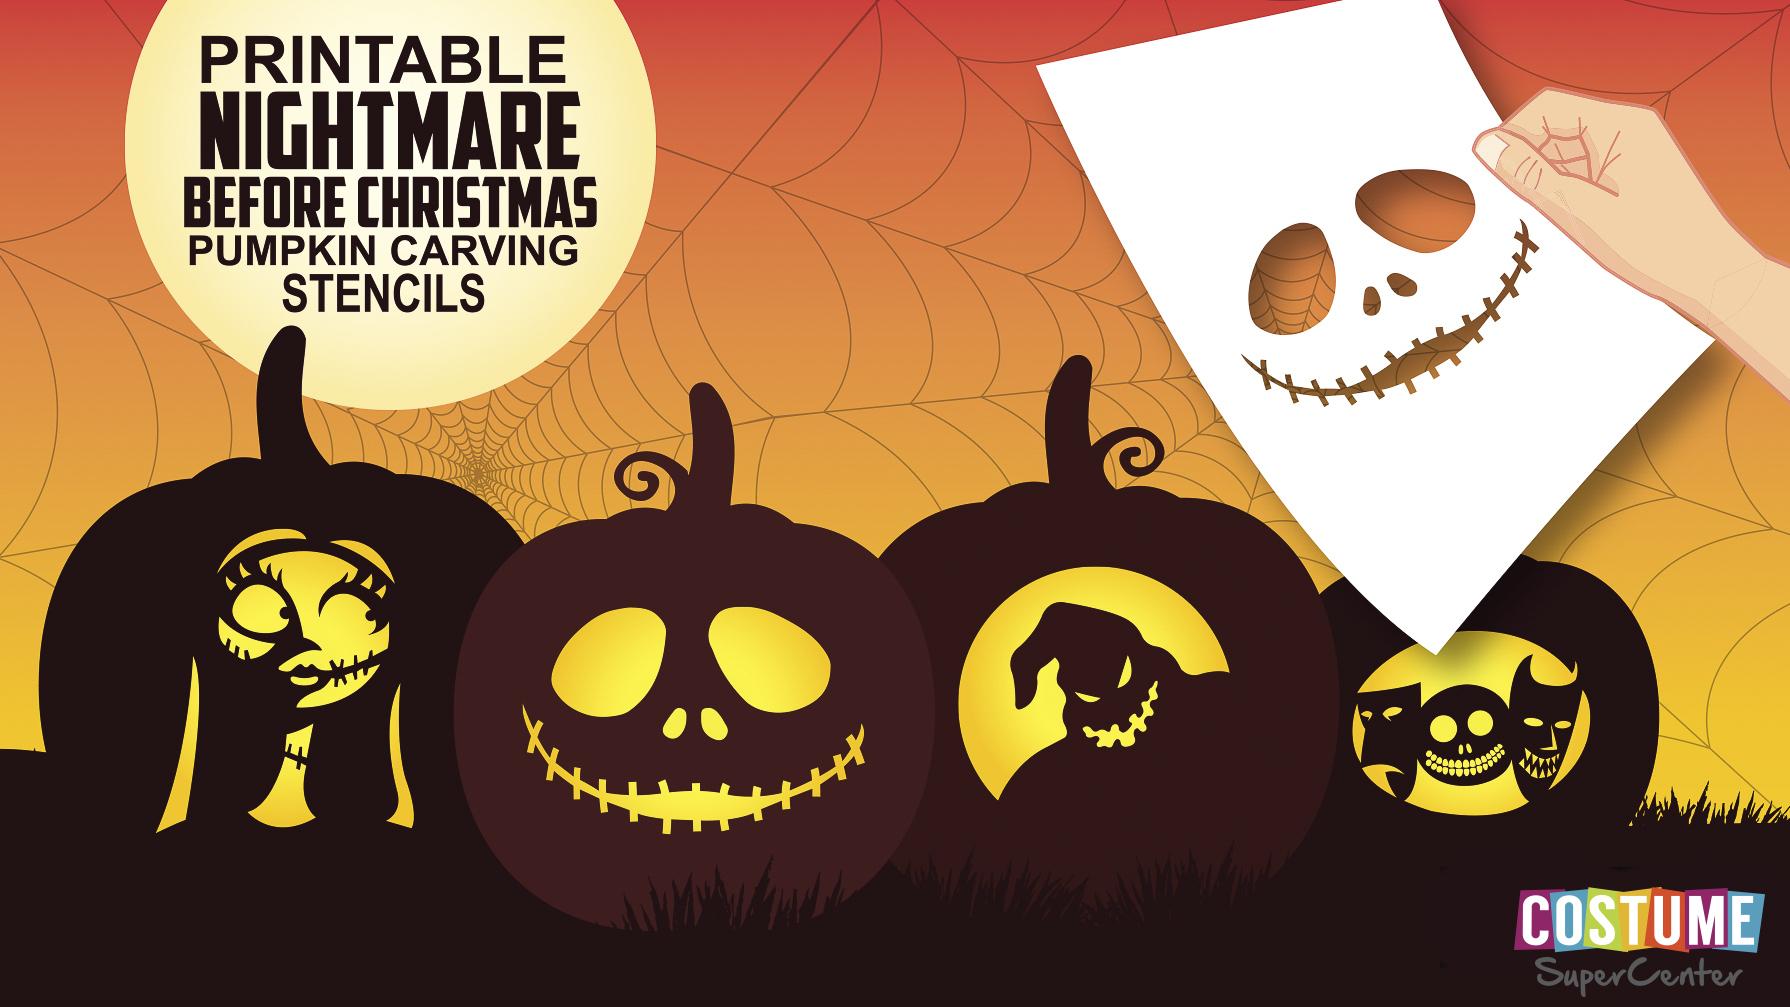 Nightmare Before Christmas Pumpkin Carving Stencils   Costume - Free Printable Nightmare Before Christmas Pumpkin Stencils